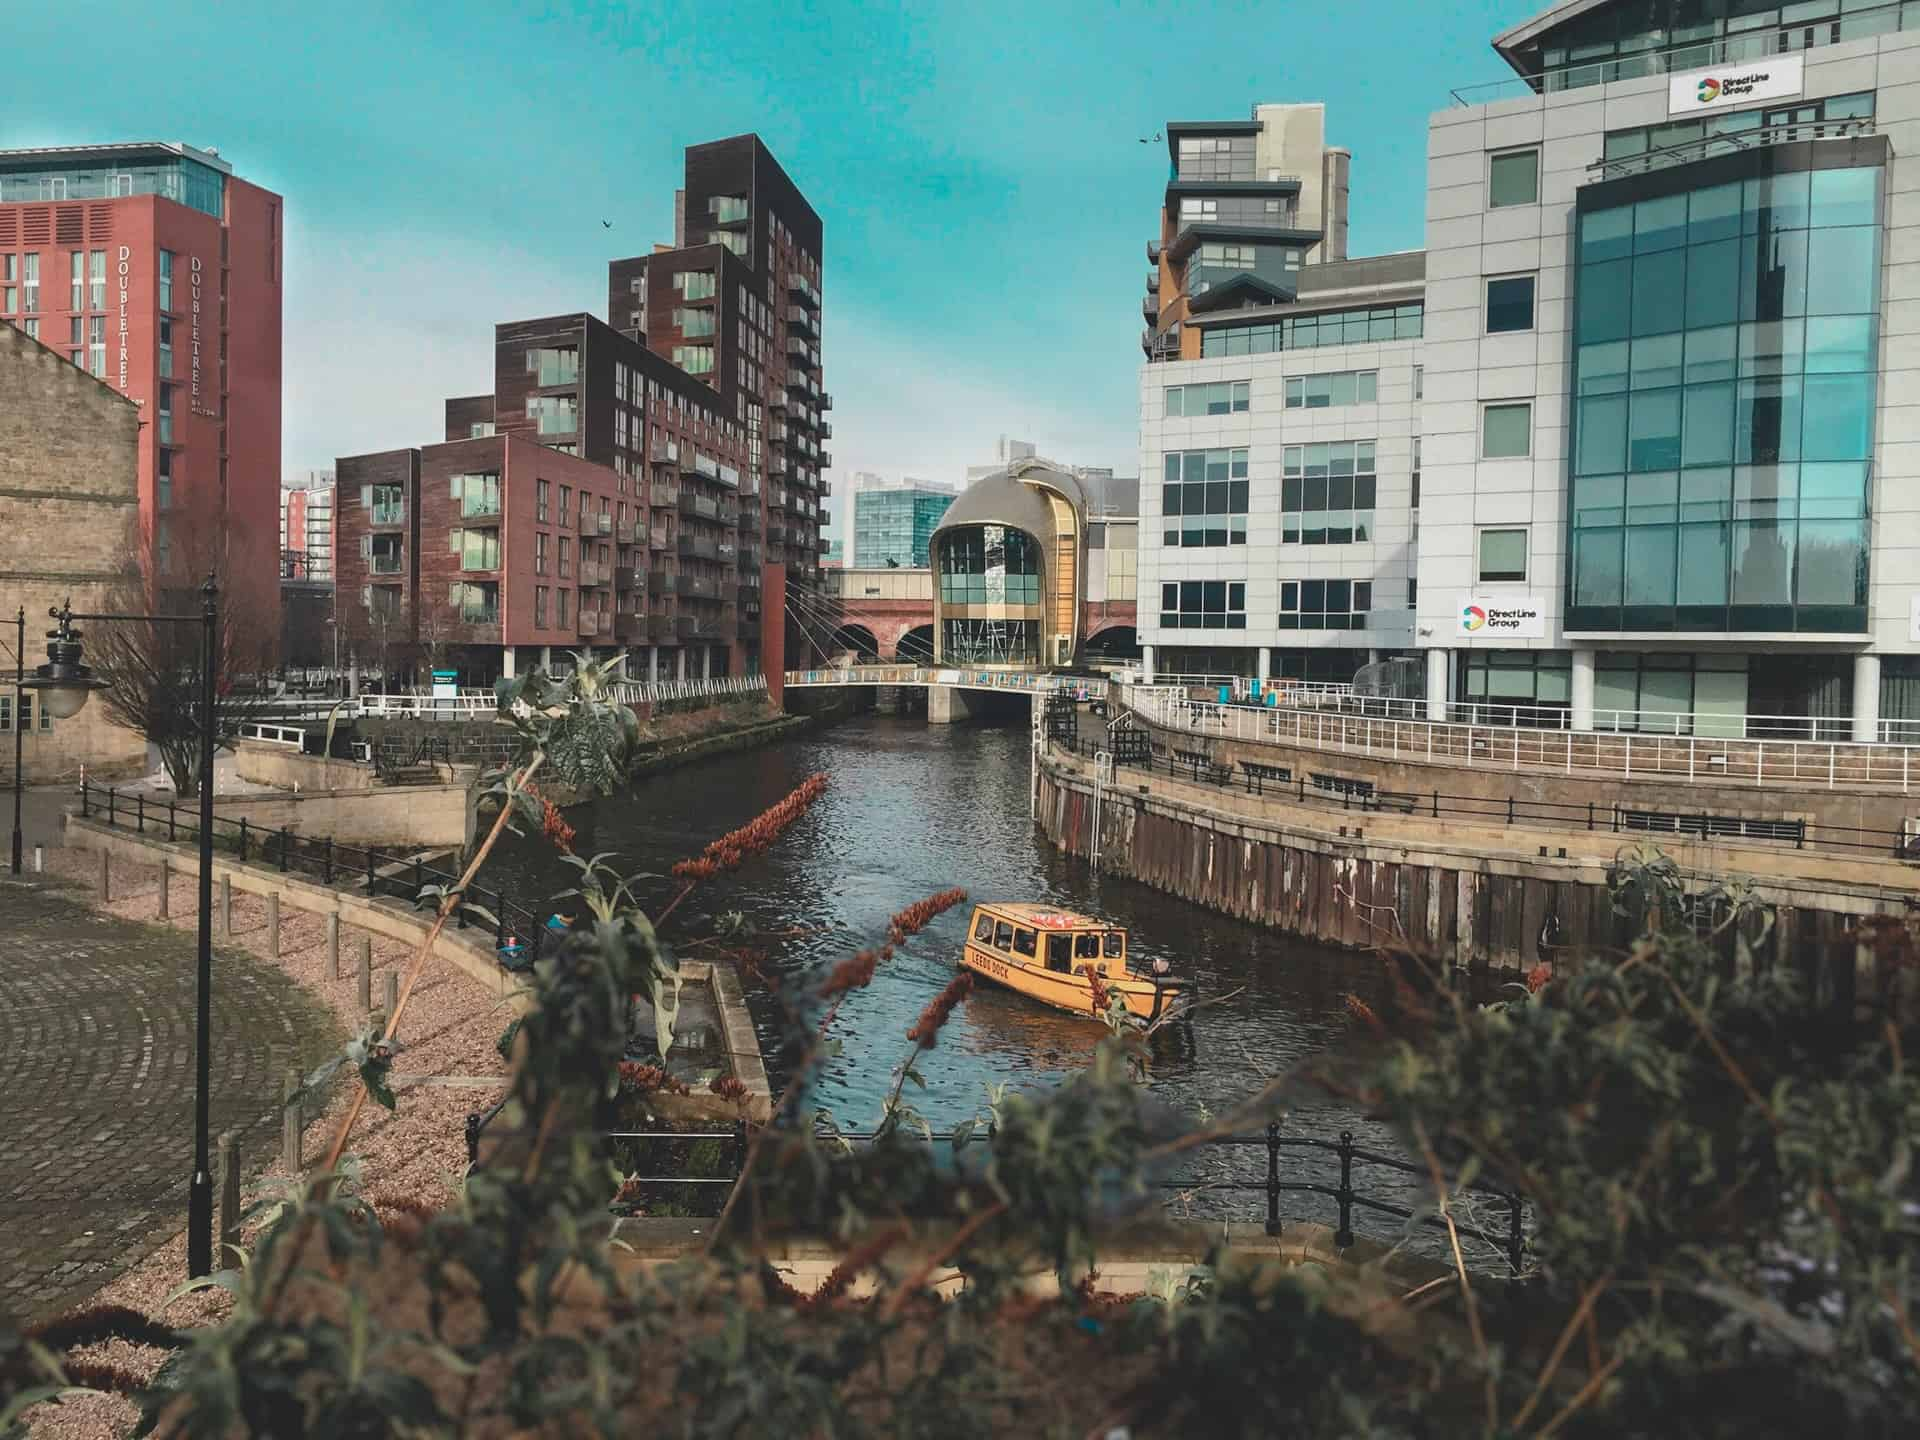 Leeds is one of the best graduate cities